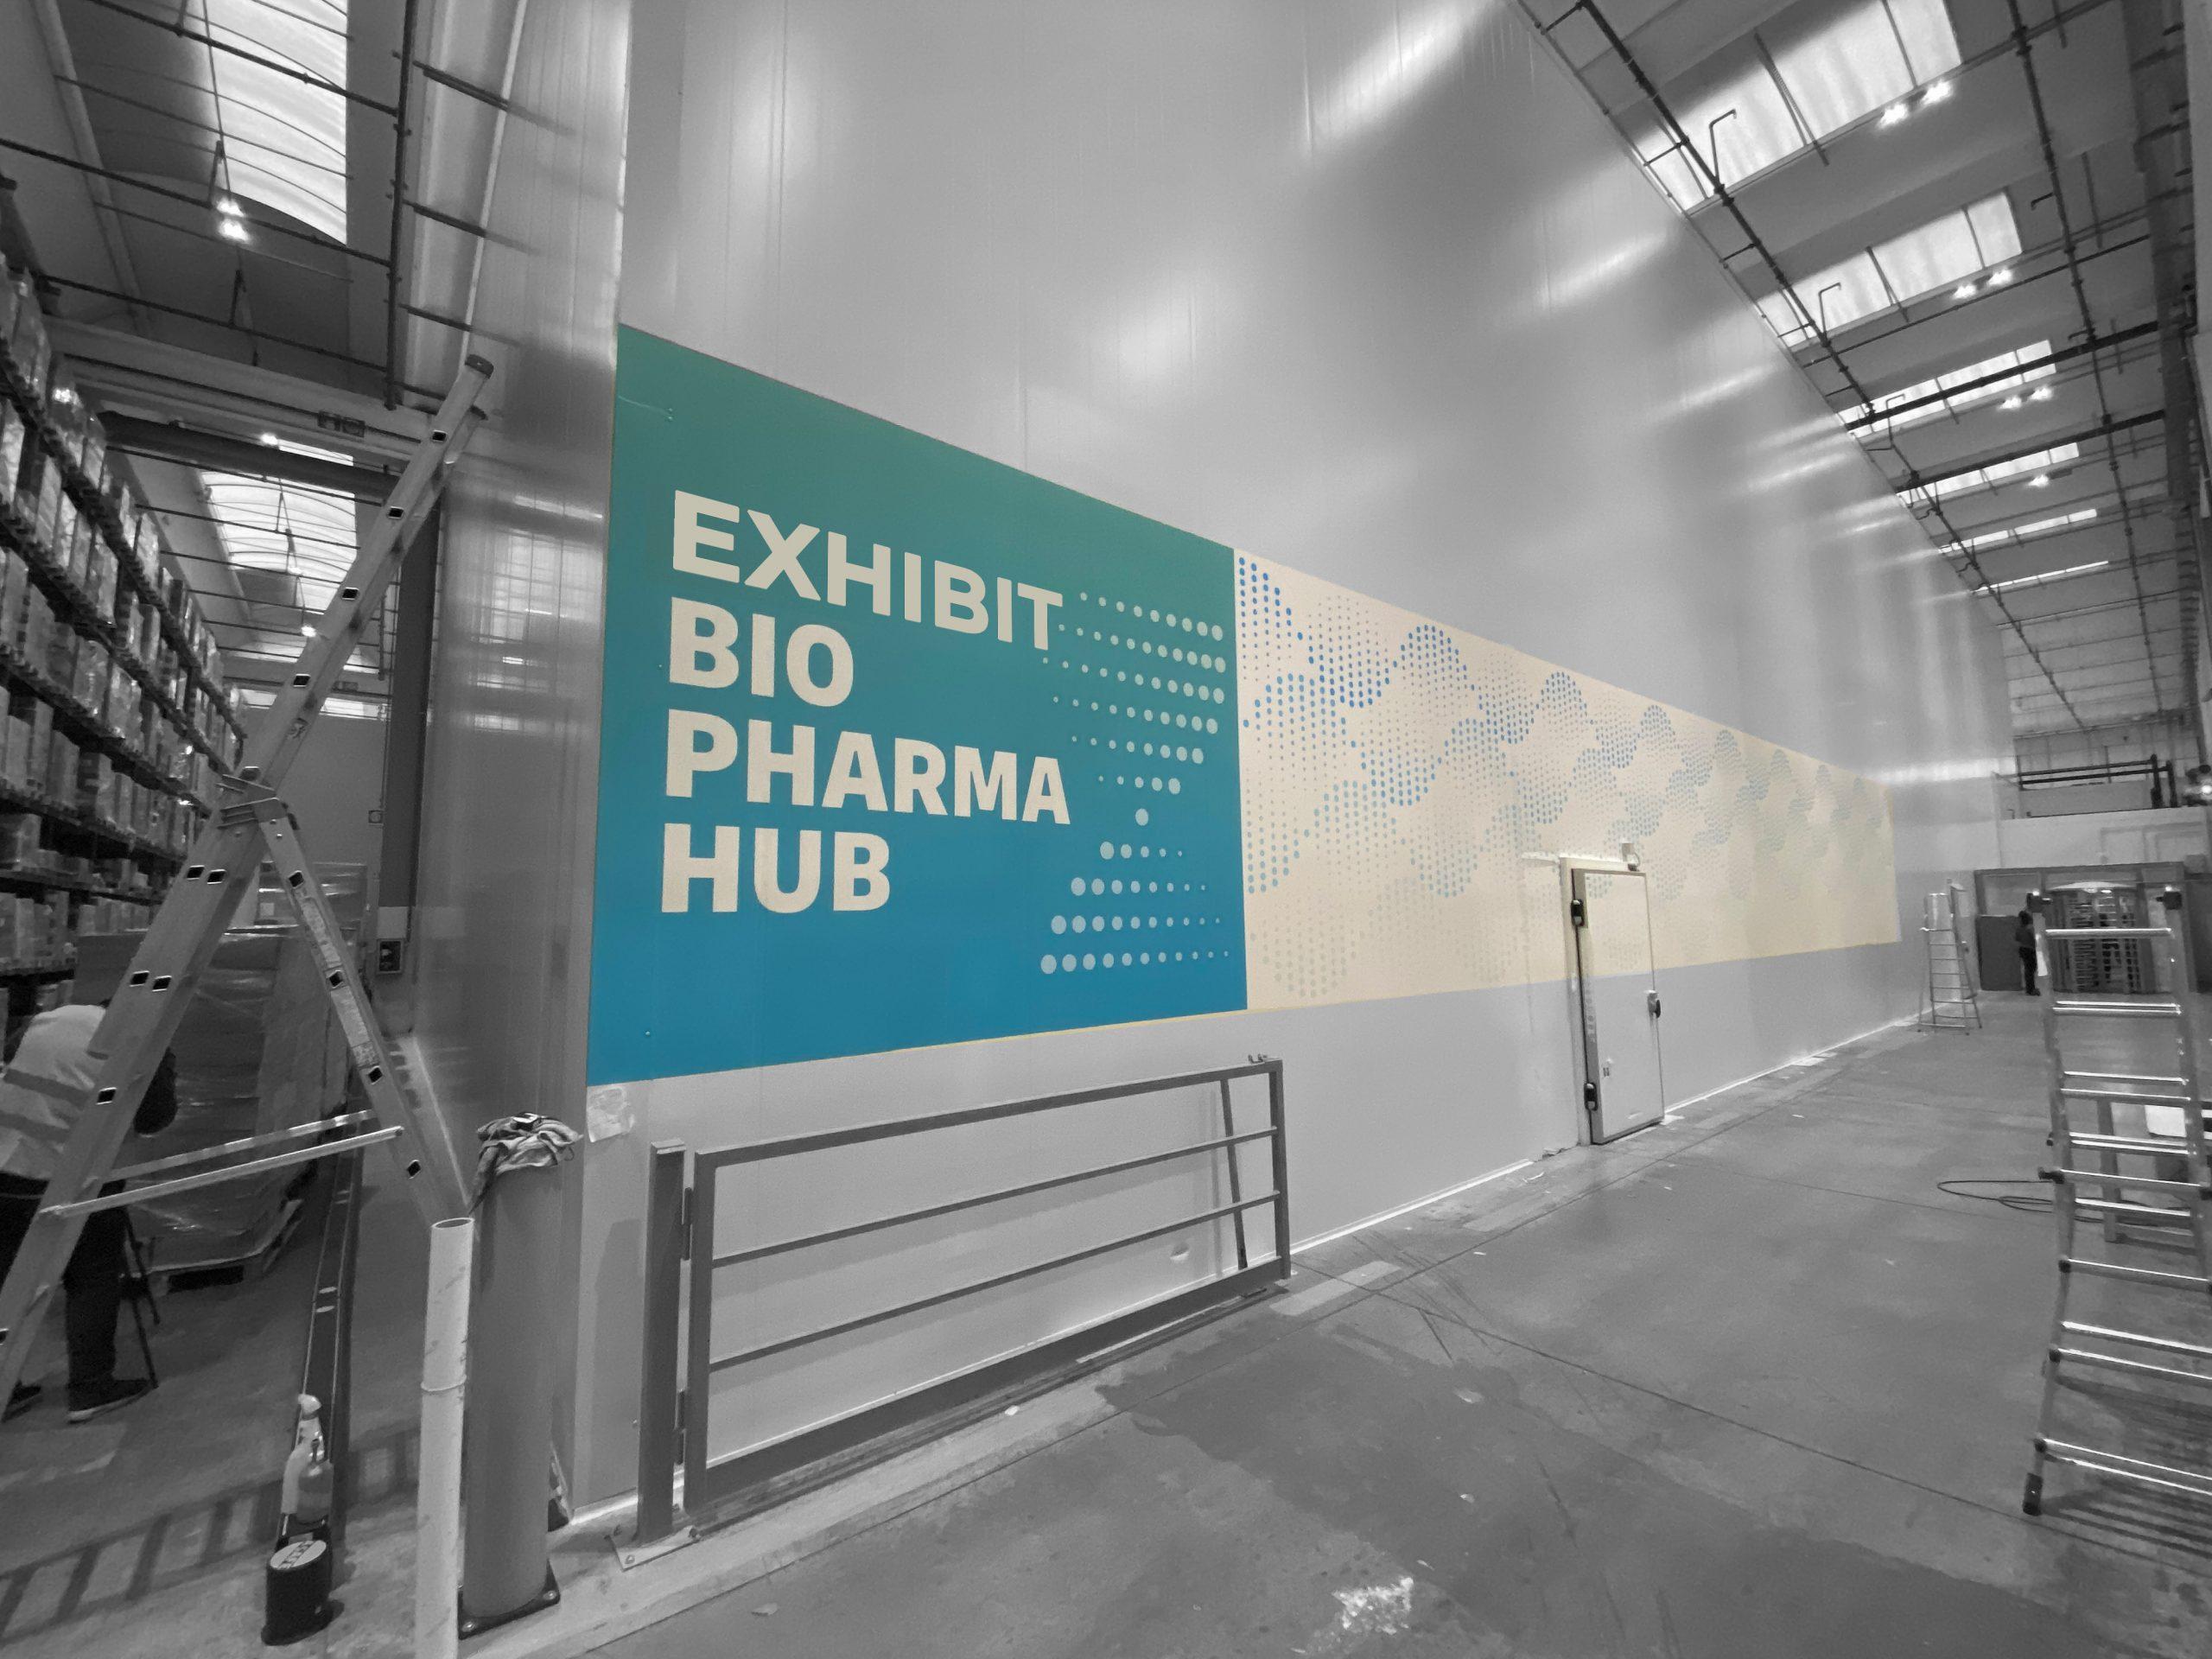 Bio pharma hub